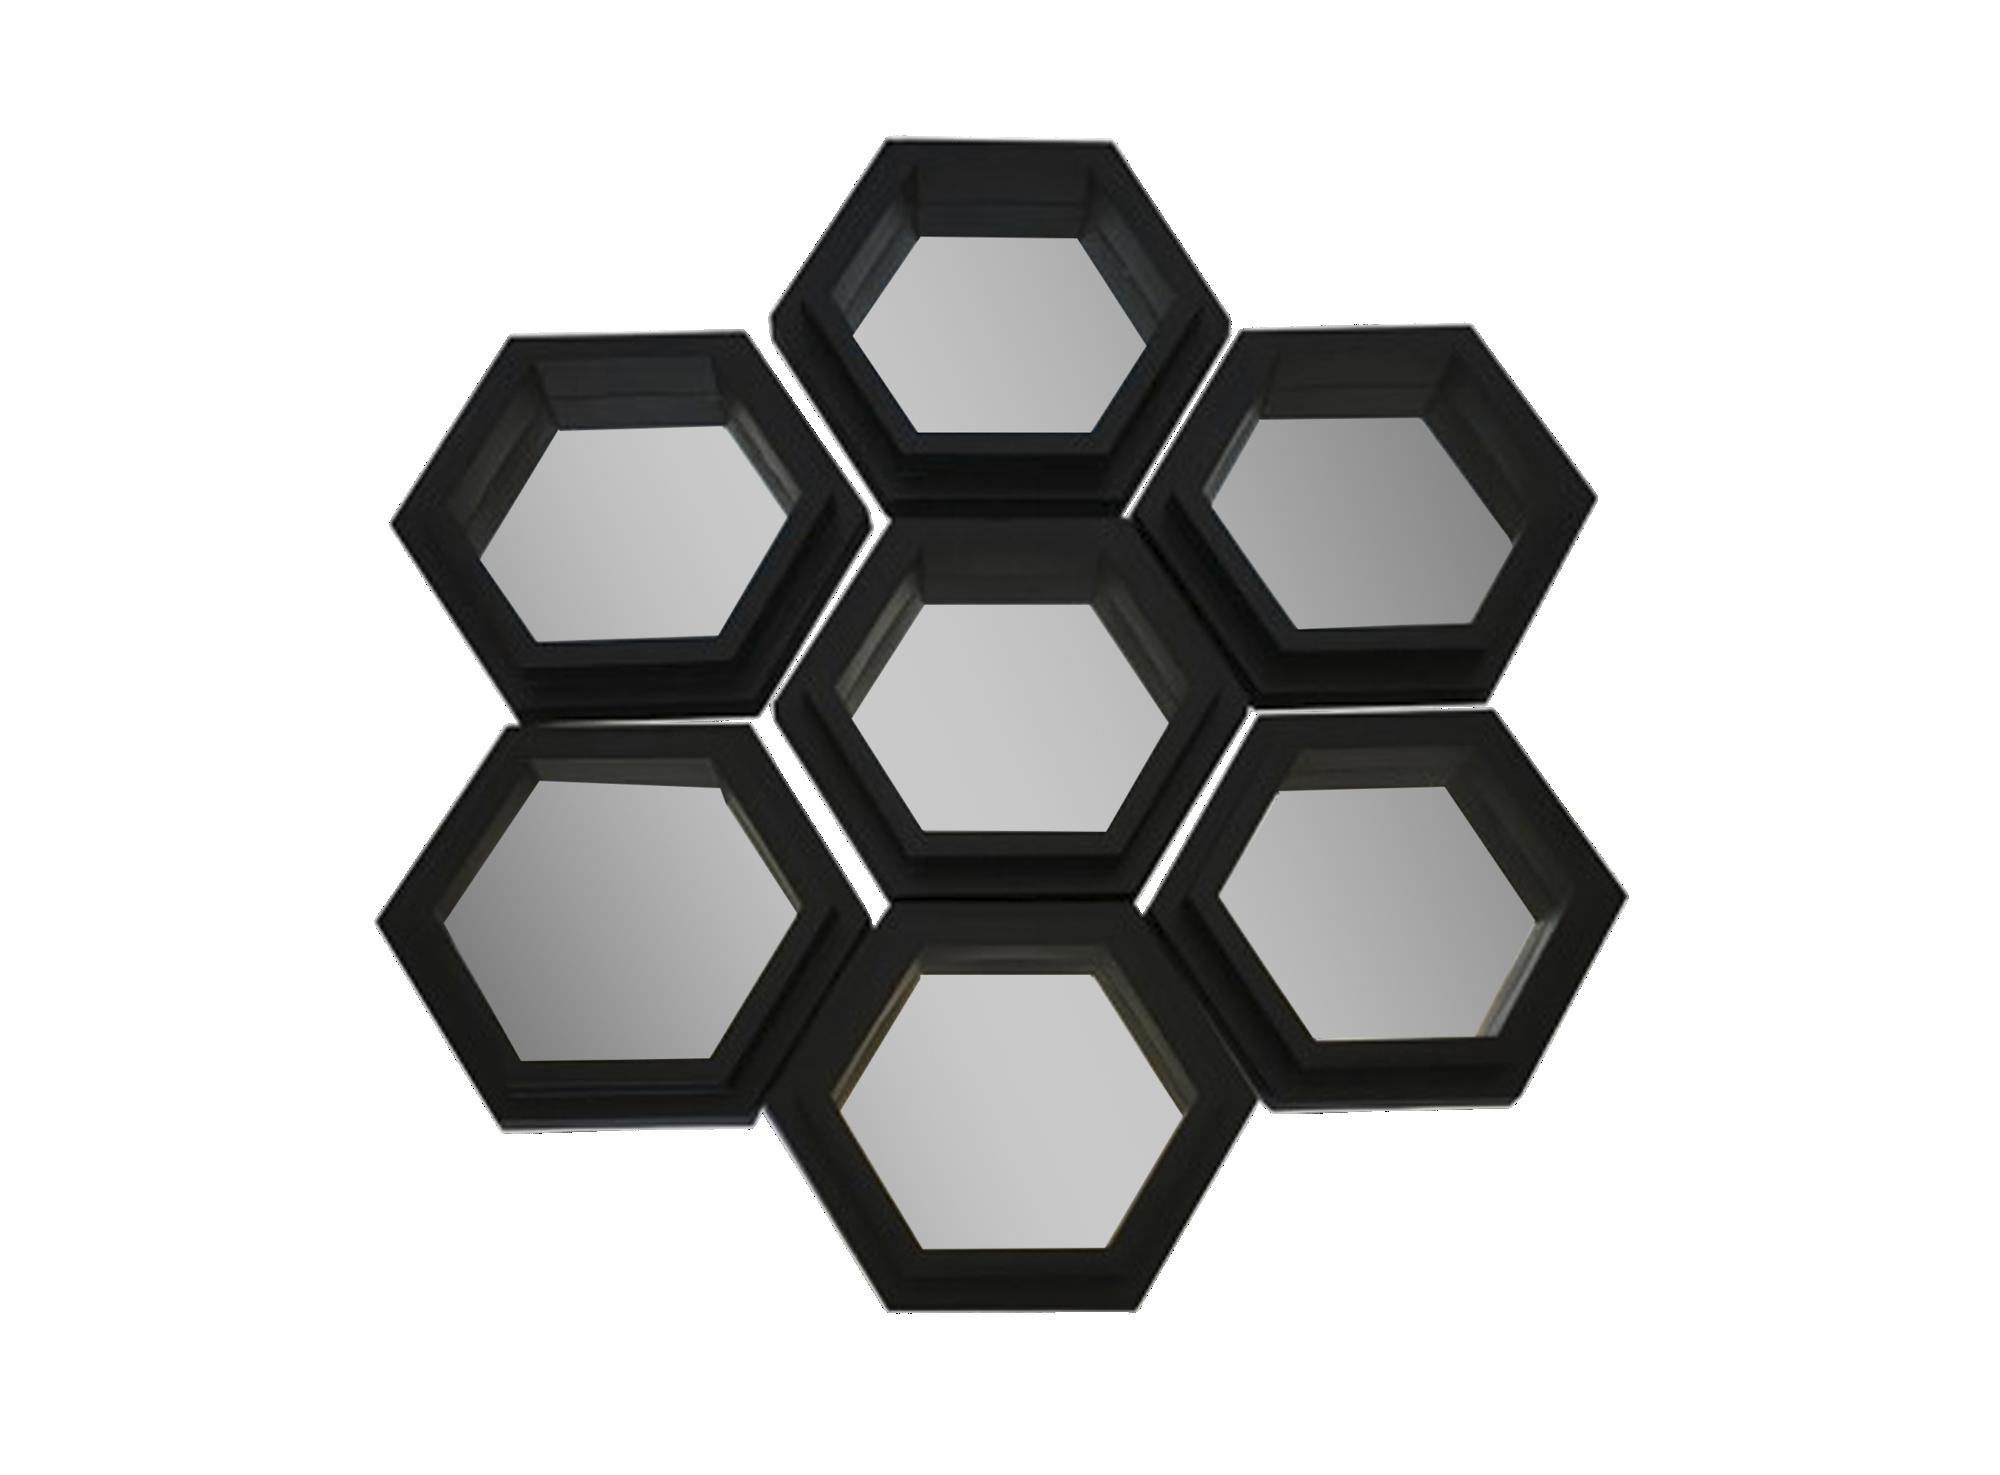 Lot 7 miroirs hexagonales 20.5x23cm - cadre en mdf noir